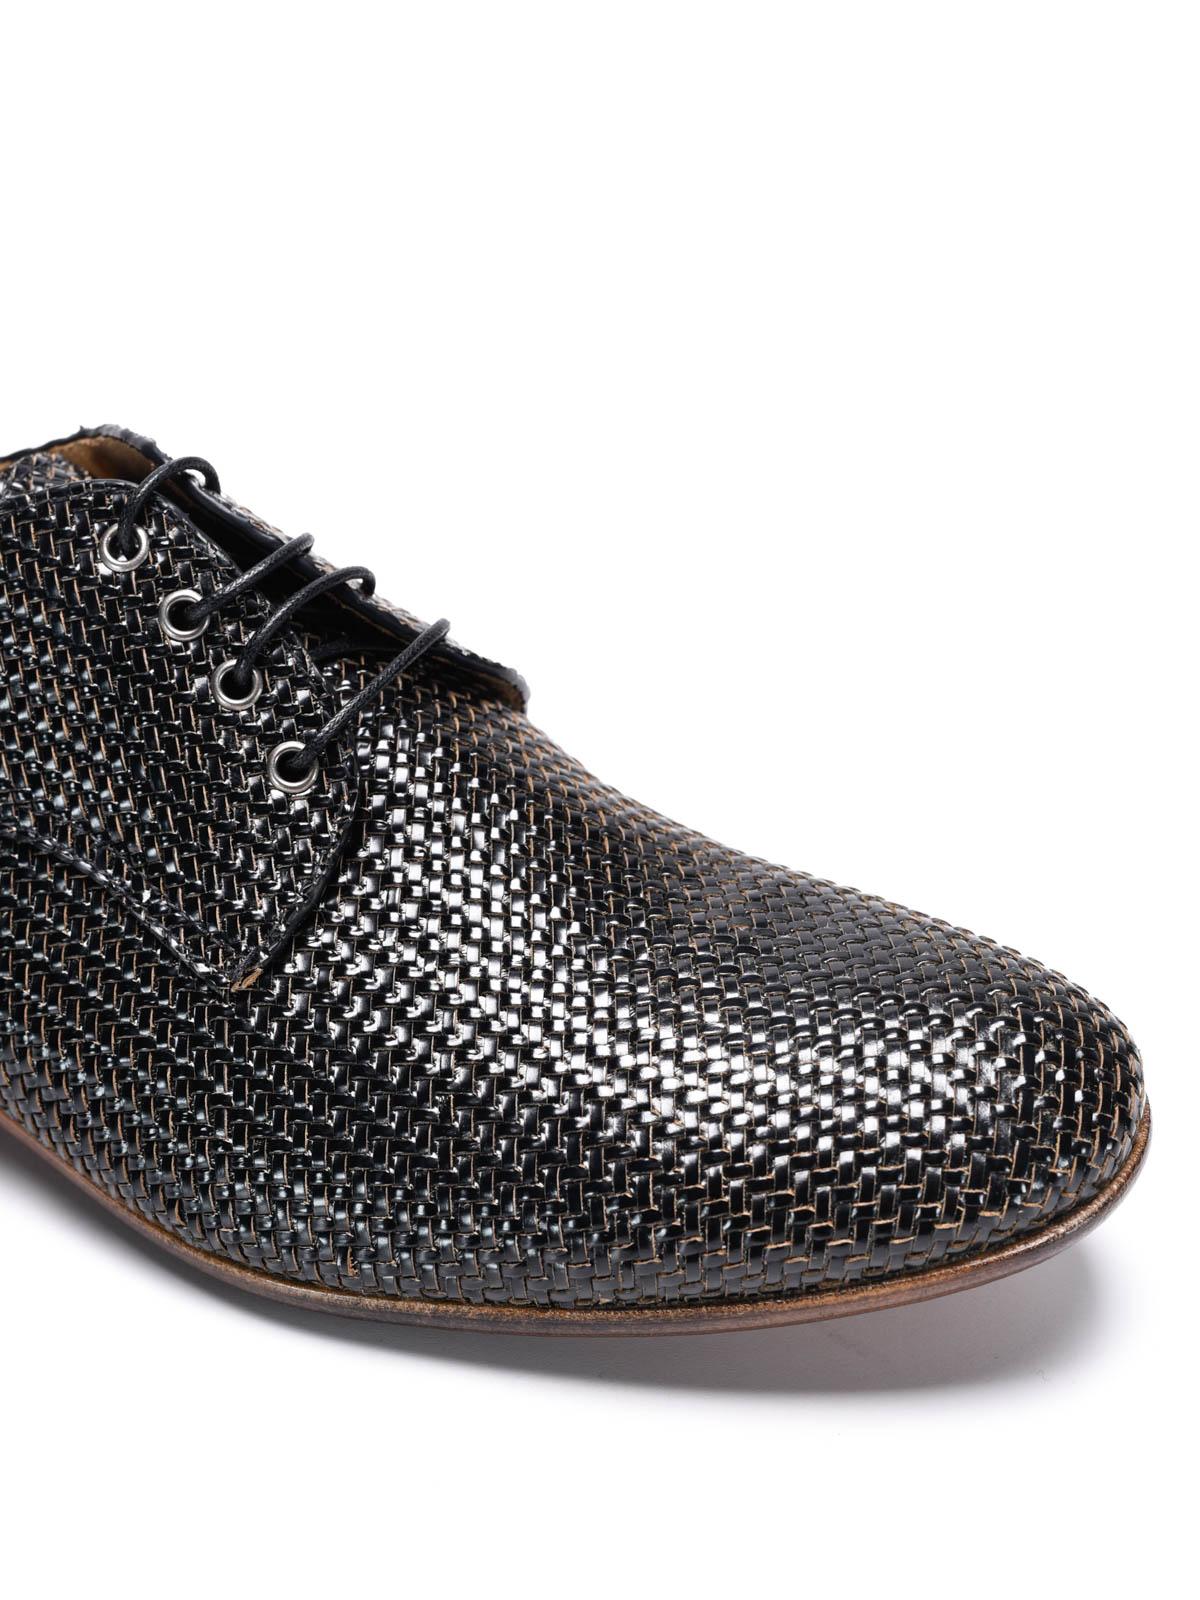 new styles 54443 06e12 Raparo - Slip-on in pelle intrecciata - scarpe stringate ...